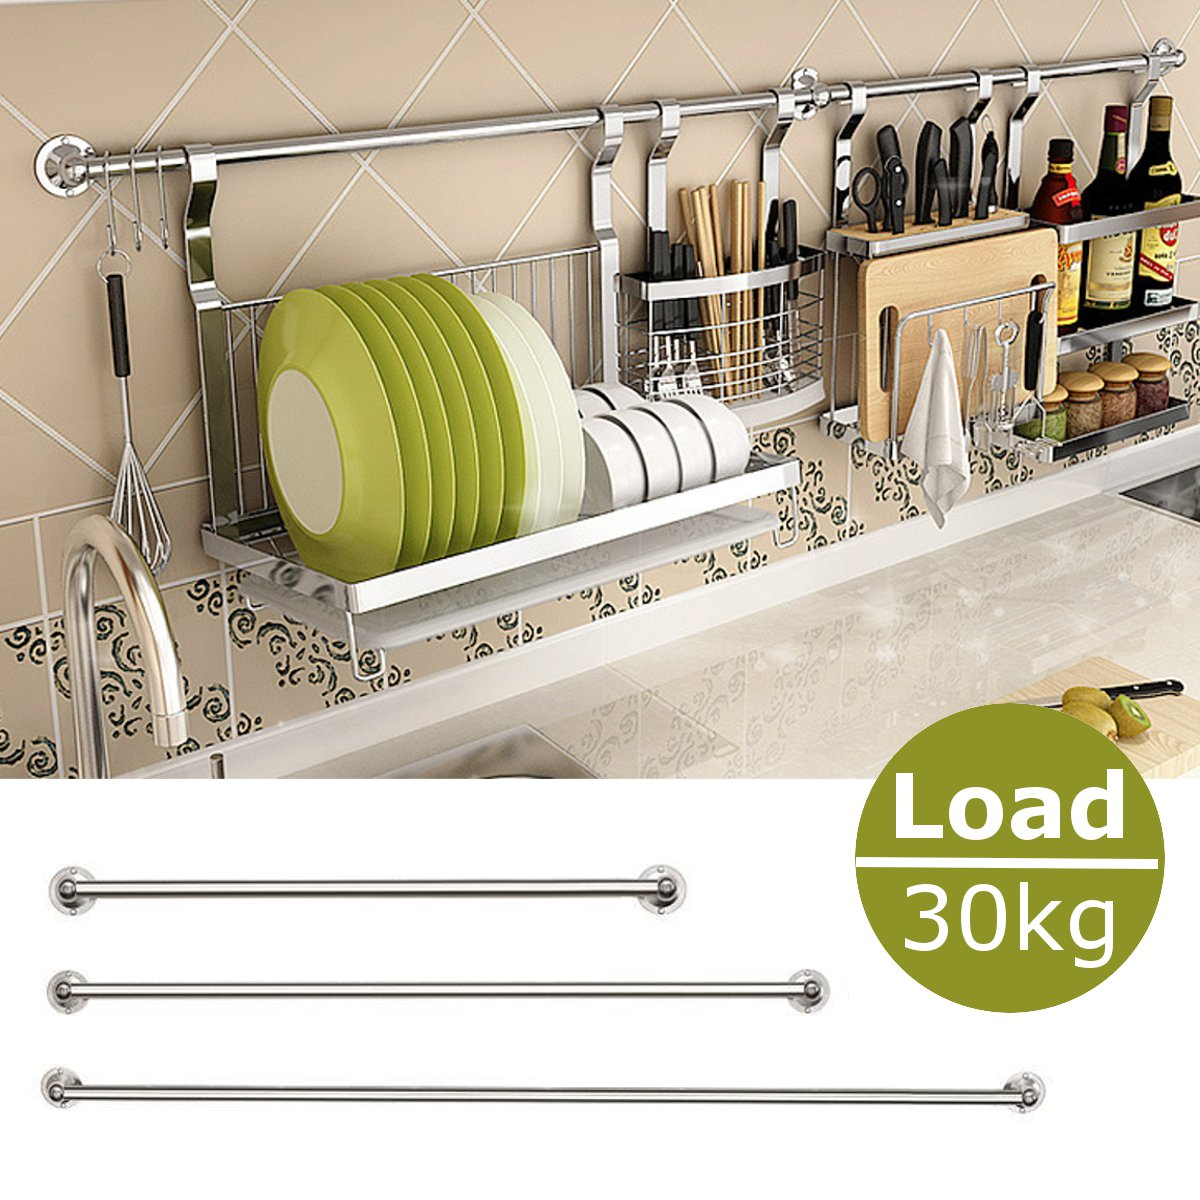 30/40/50/60cm Stainless Steel Hanging Rod Home Kitchen Bar Organizer Wall Mounted Storage Stick Holder Kitchen Tools Accessories